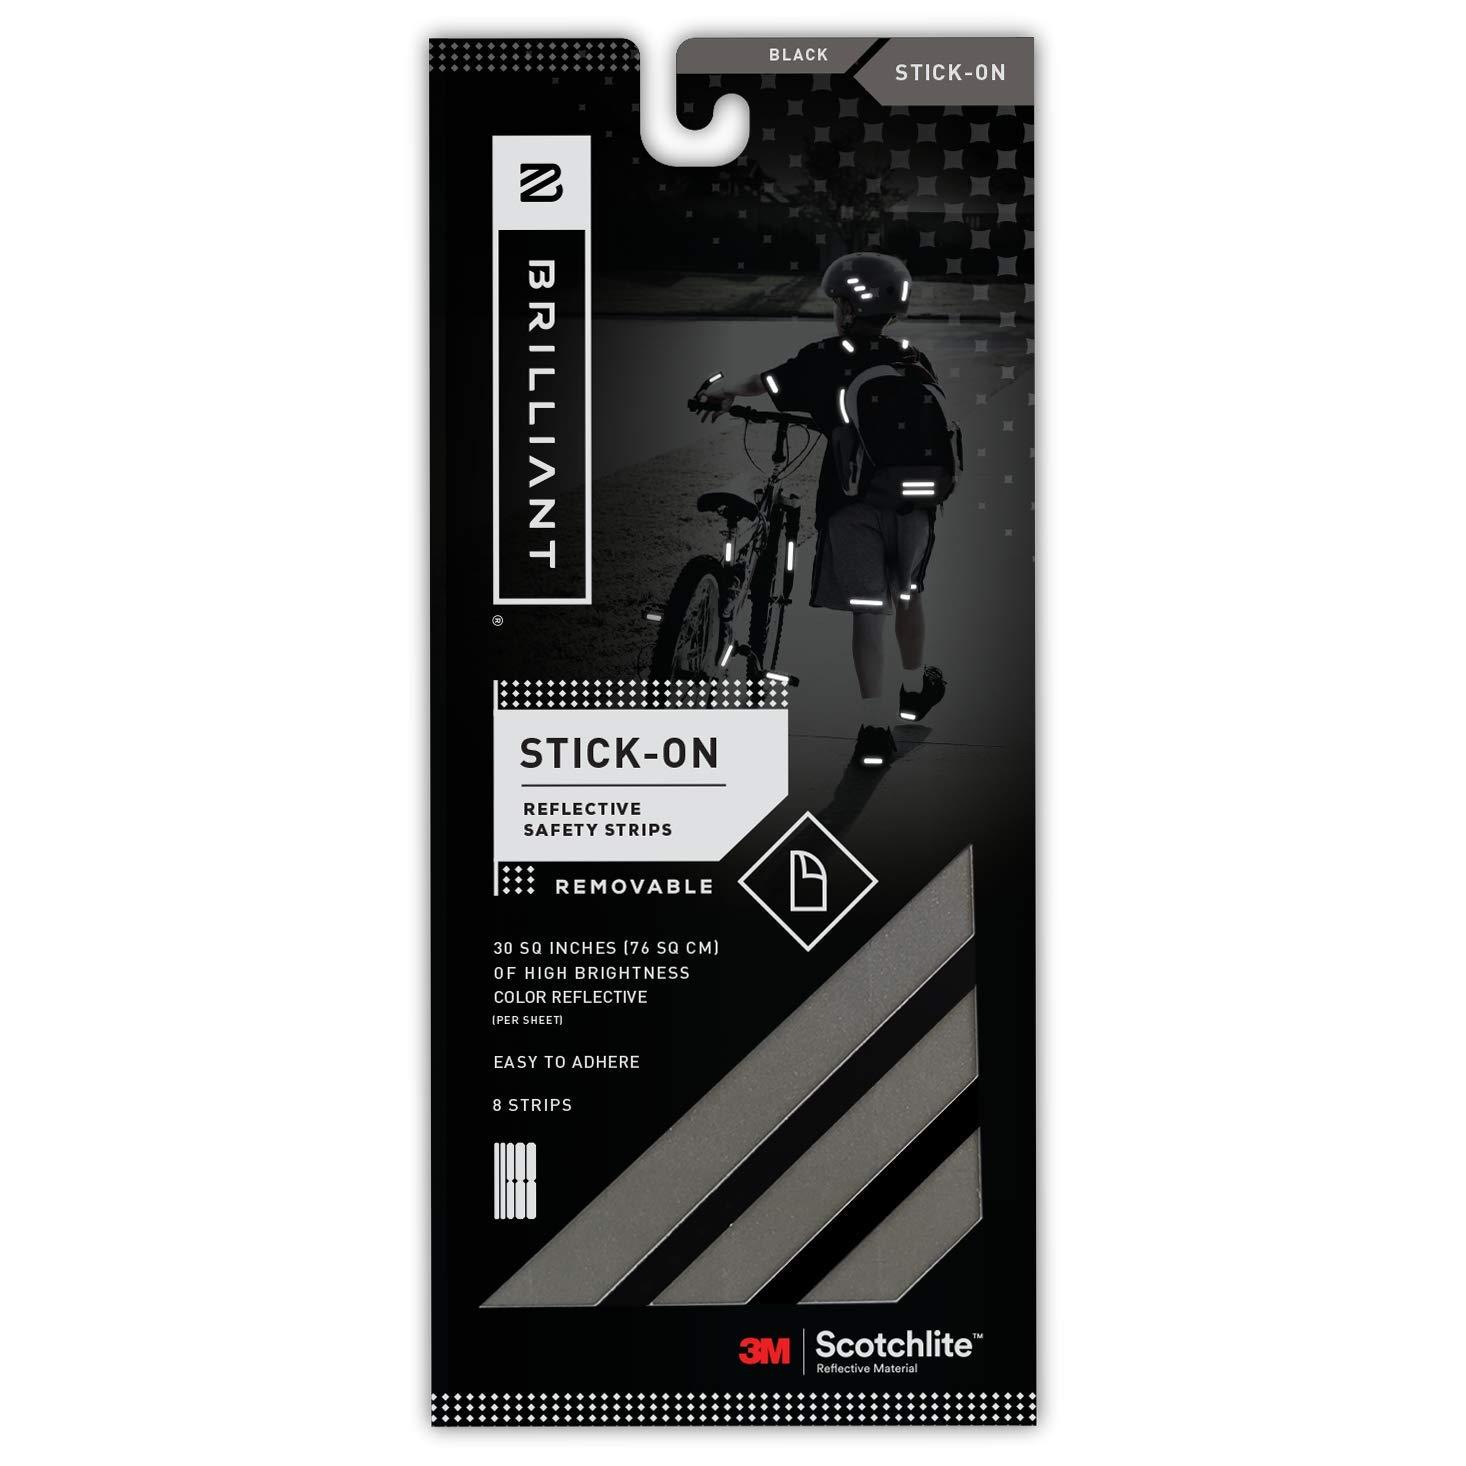 Brilliant® Reflective Strips, Stick-On